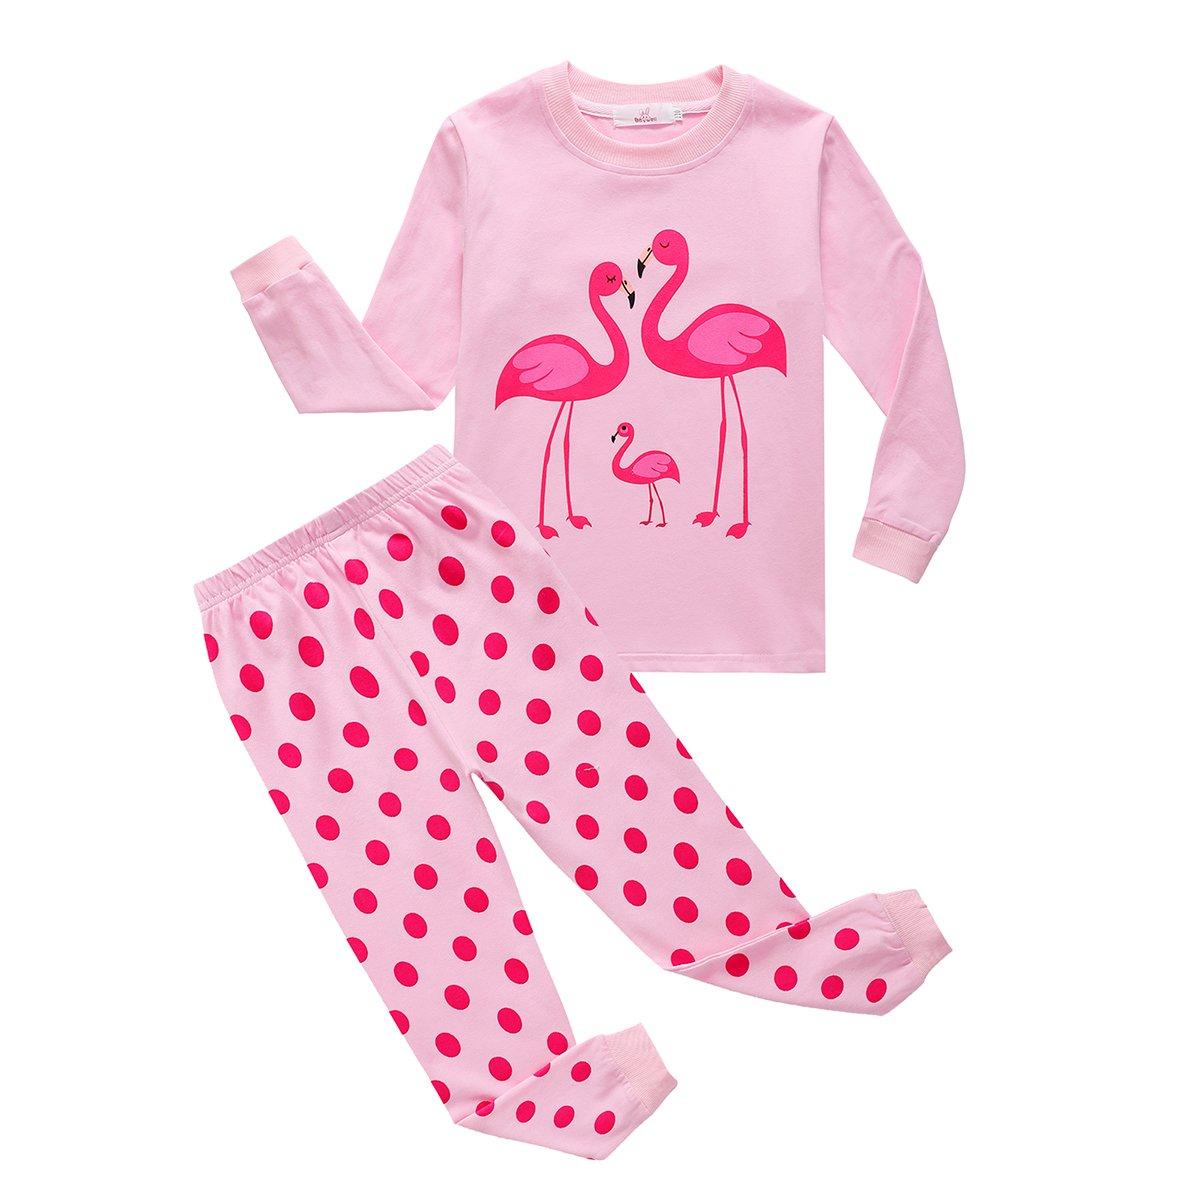 BOBORA Baby Girls Pyjamas Set Kids Children Giraffe Mermaid Flamingo Cotton Sleepwear Pjs Set Clothing for 1-8Years BON-N-2174